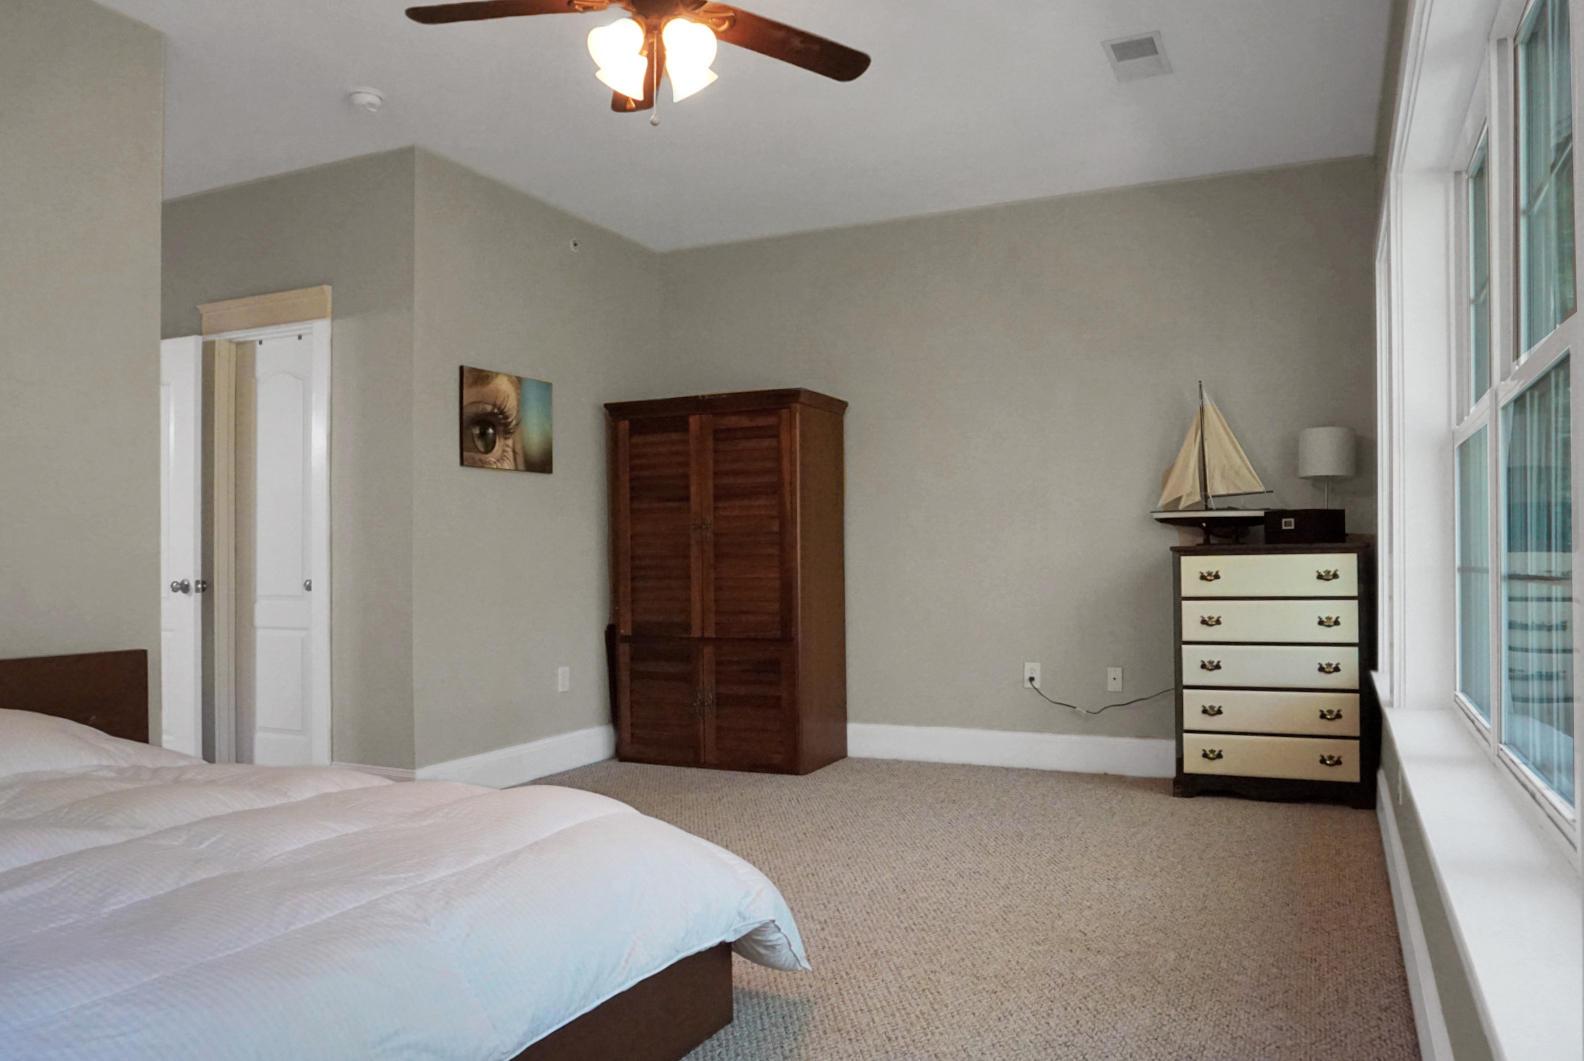 Etiwan Pointe Homes For Sale - 269 Etiwan Pointe, Mount Pleasant, SC - 26